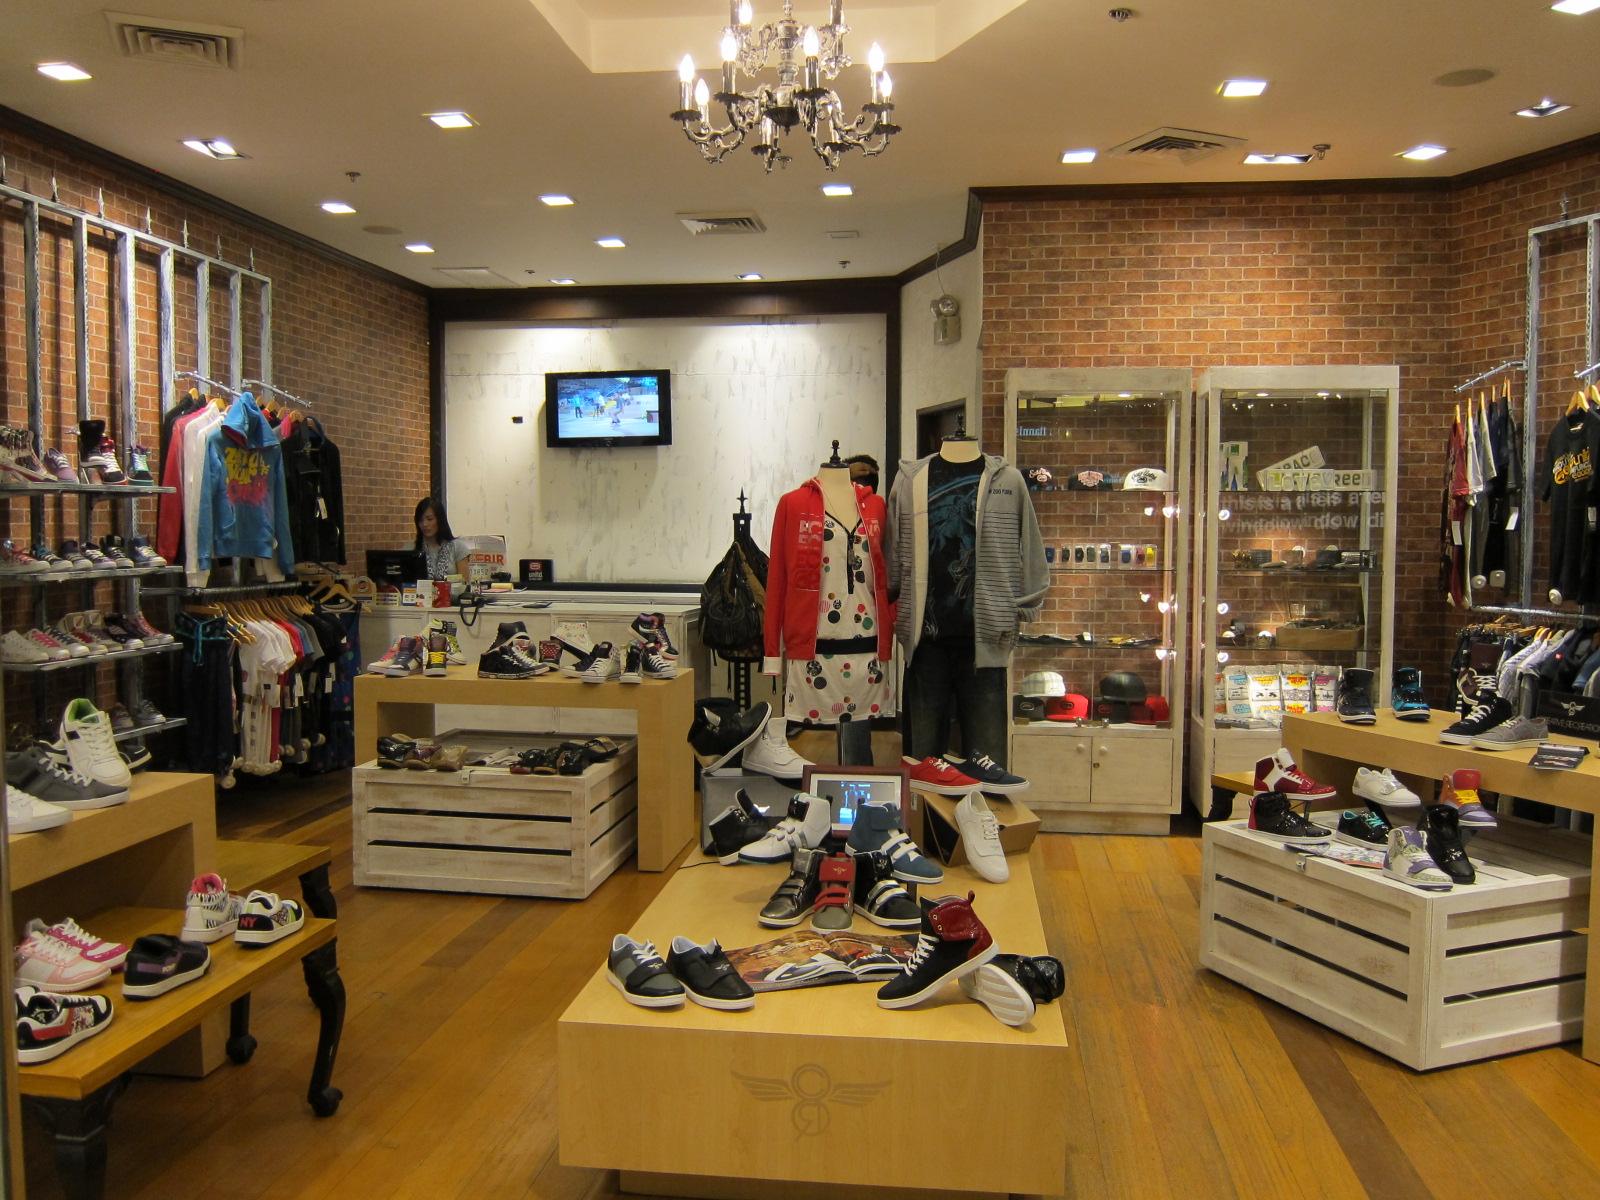 b9c3cccd68f Newest Fashion Store at Ayala Center Cebu is COMPLEX Lifestyle Store